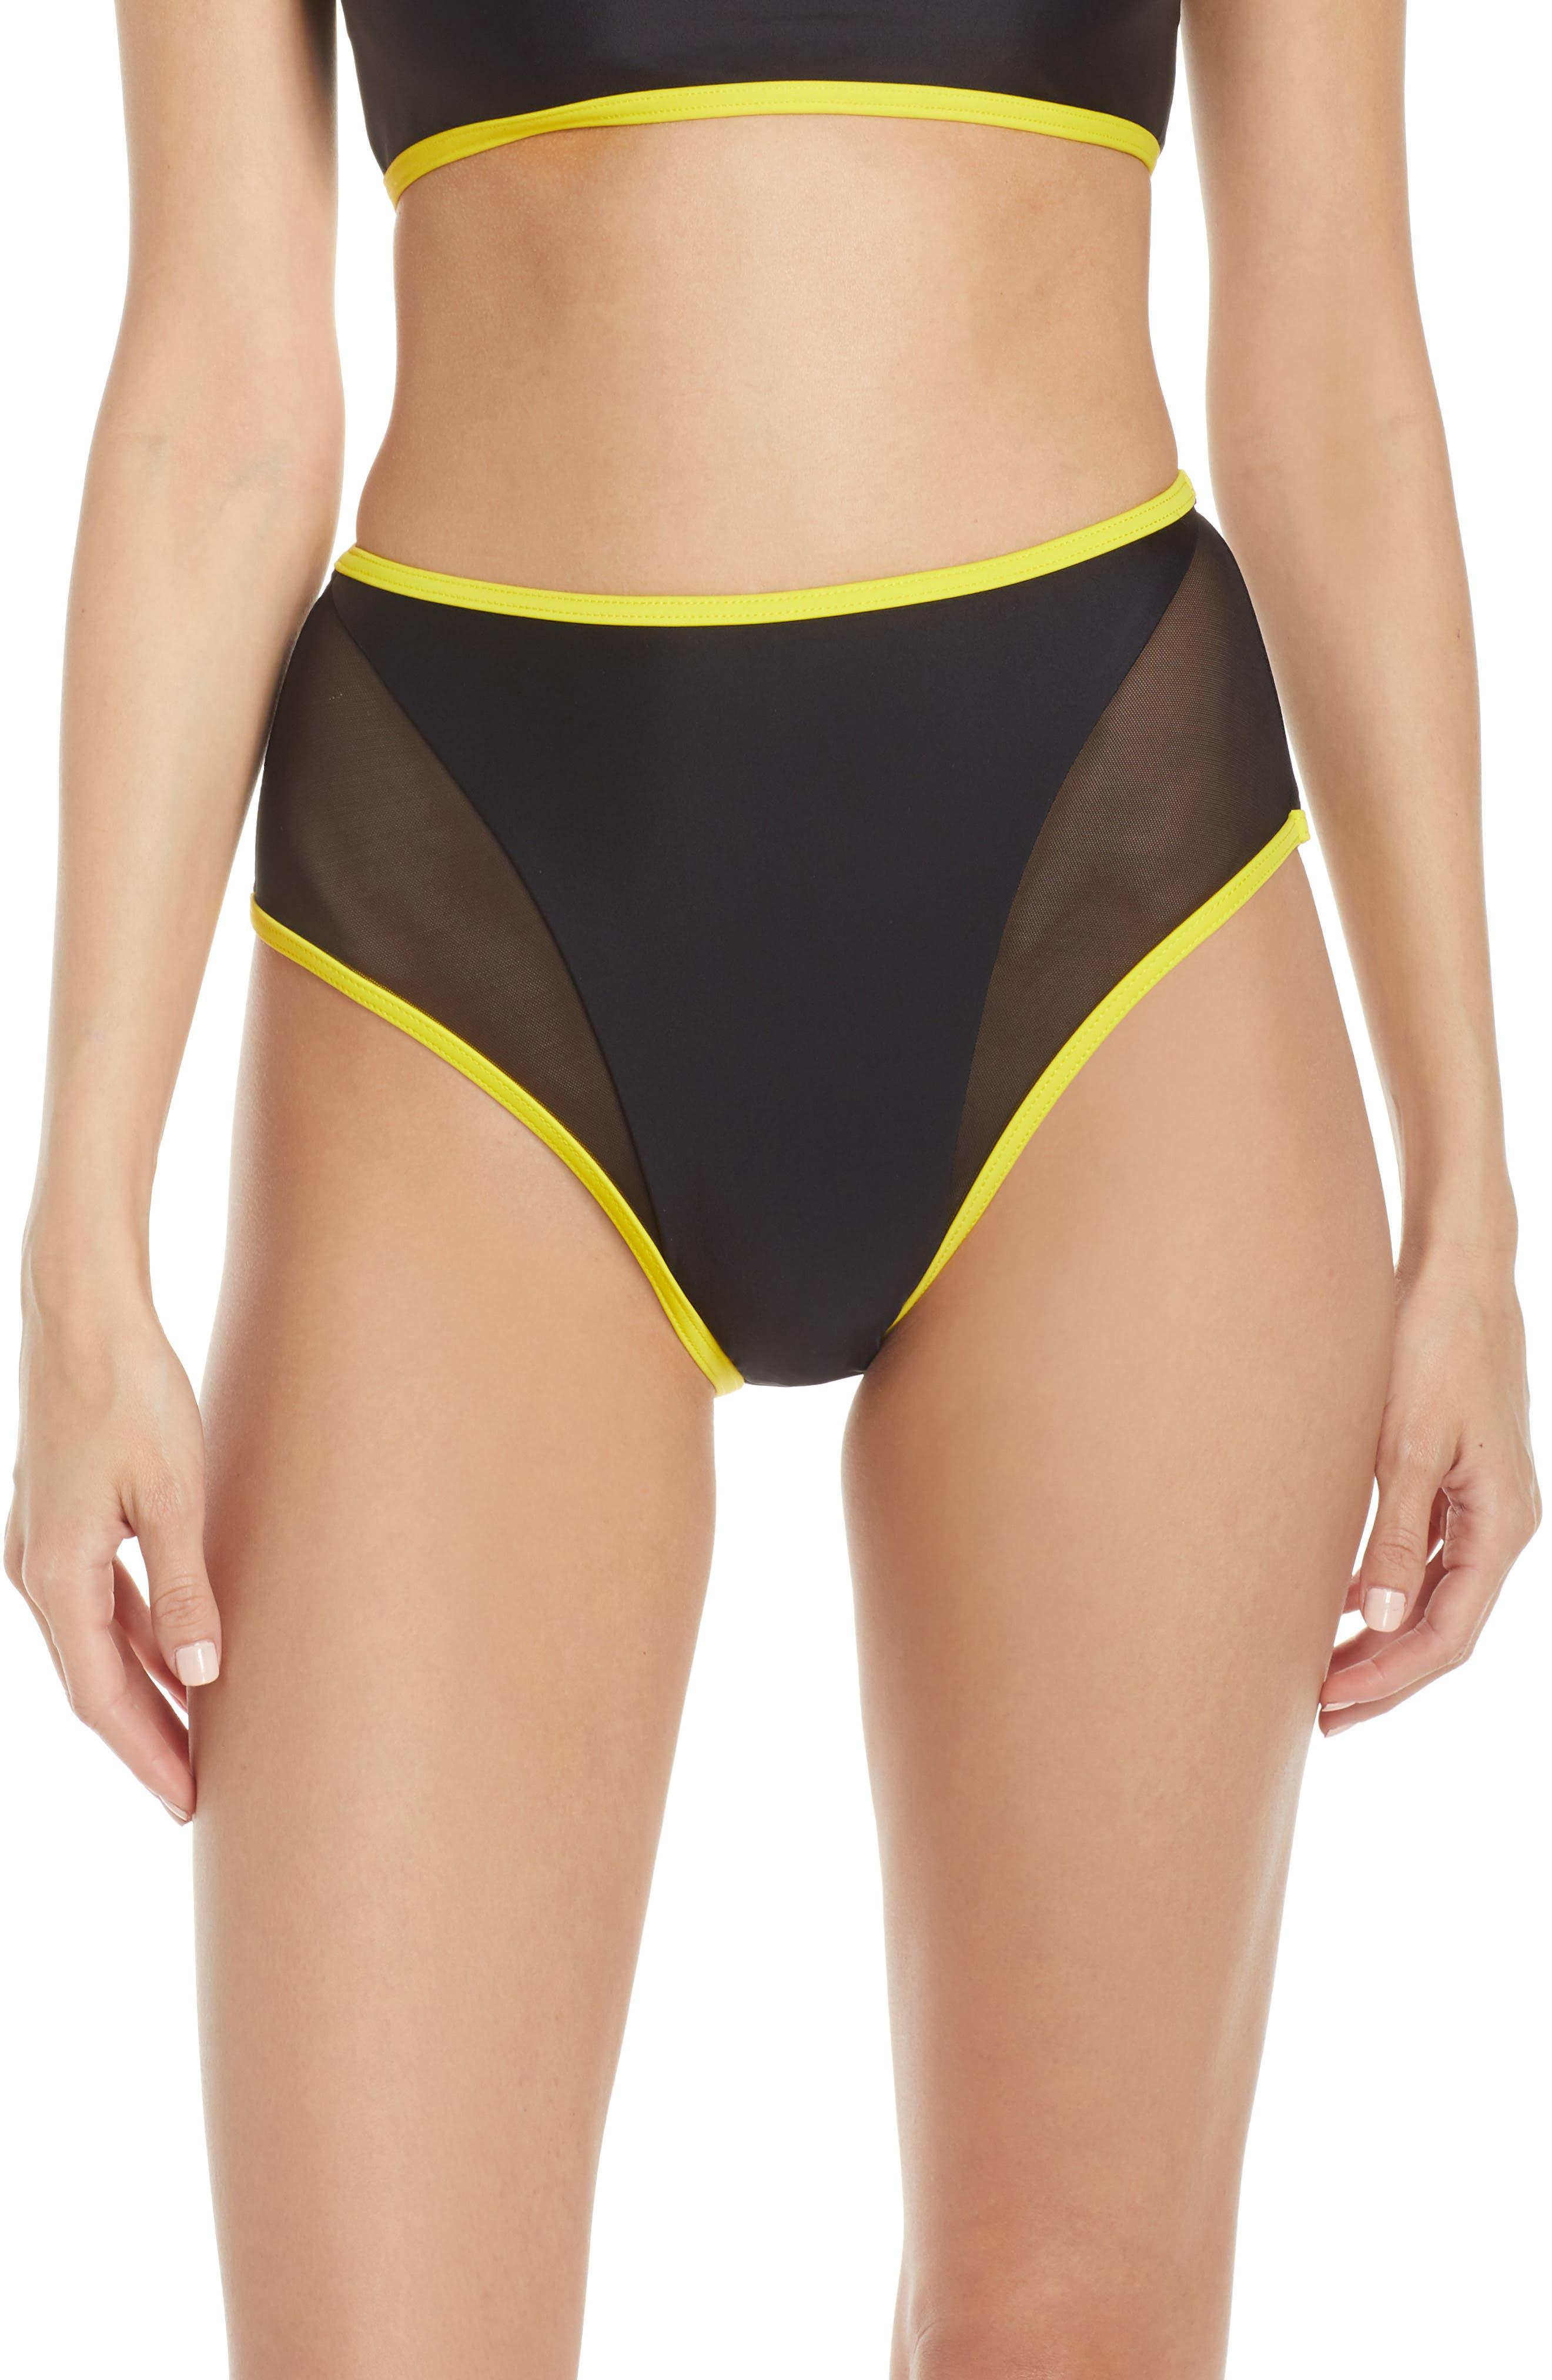 Chromat High Waist Bikini Bottoms, Black